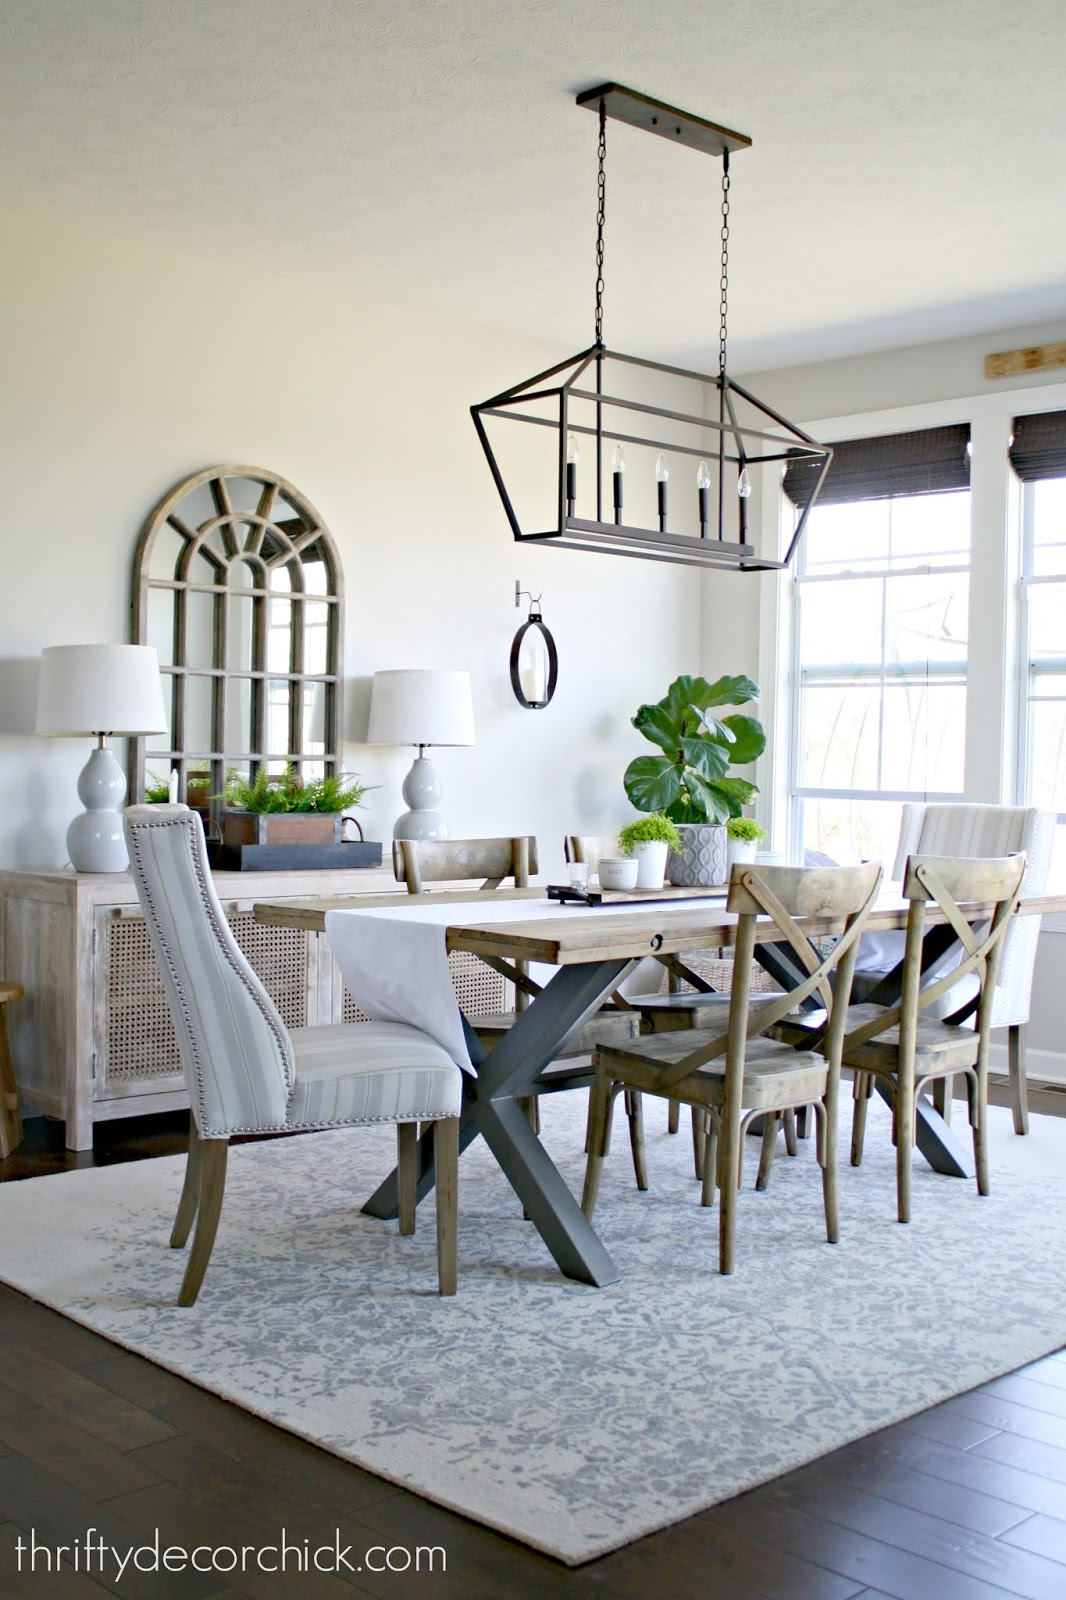 Morning room/dining area